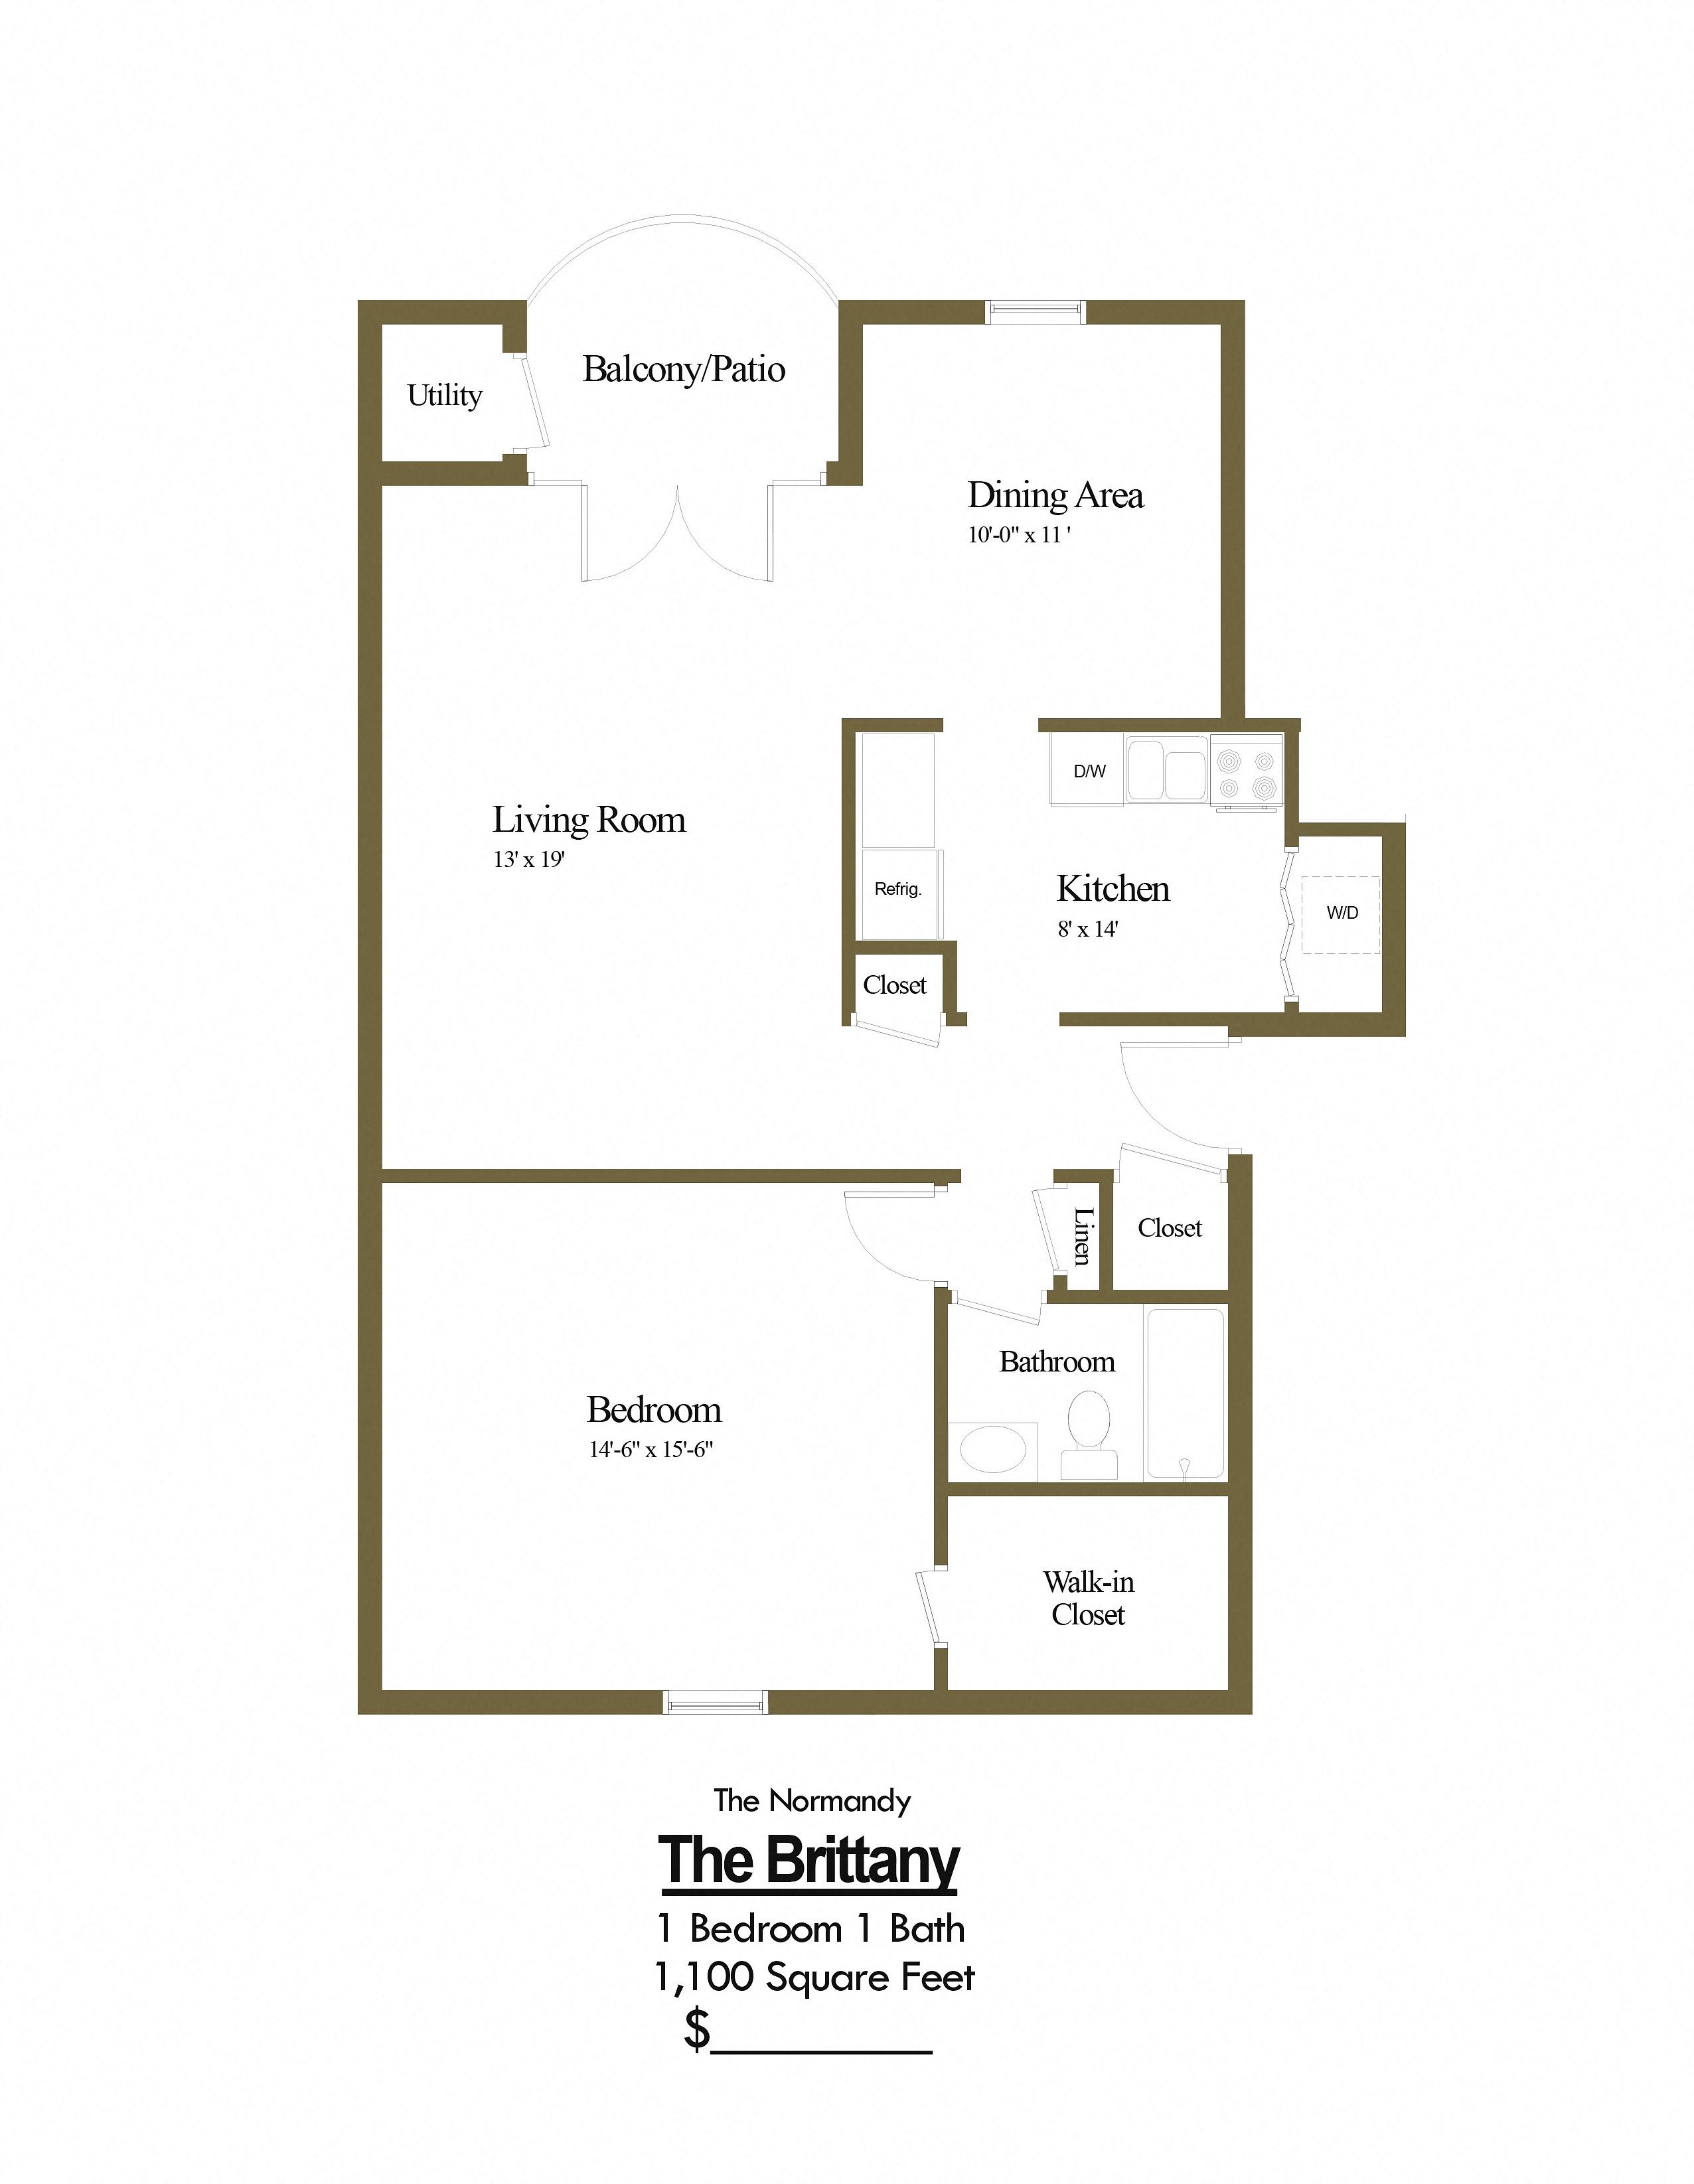 1 bedroom 1 bathroom floorplan in pikesville maryland